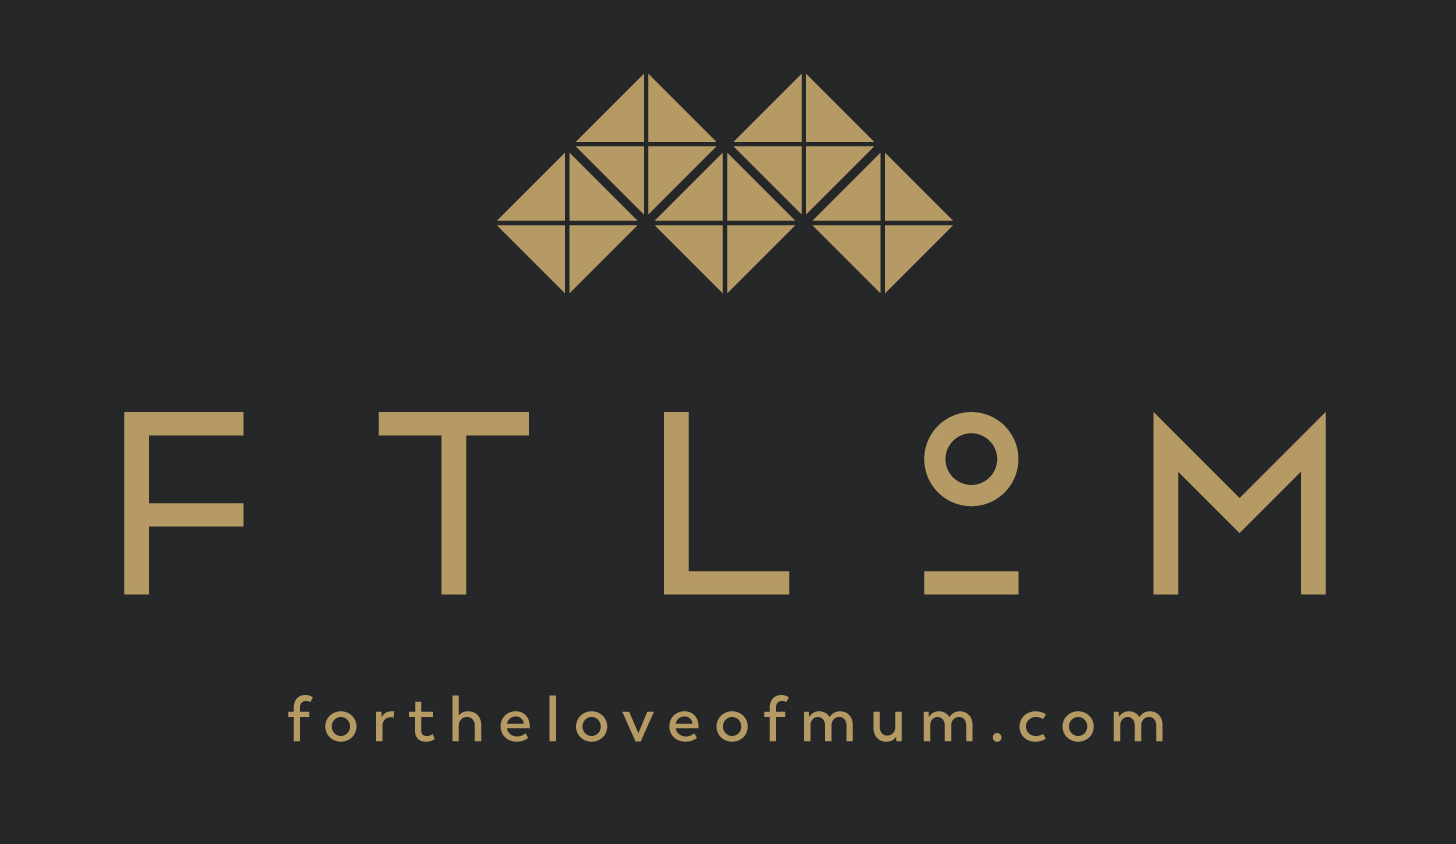 ftlom logo